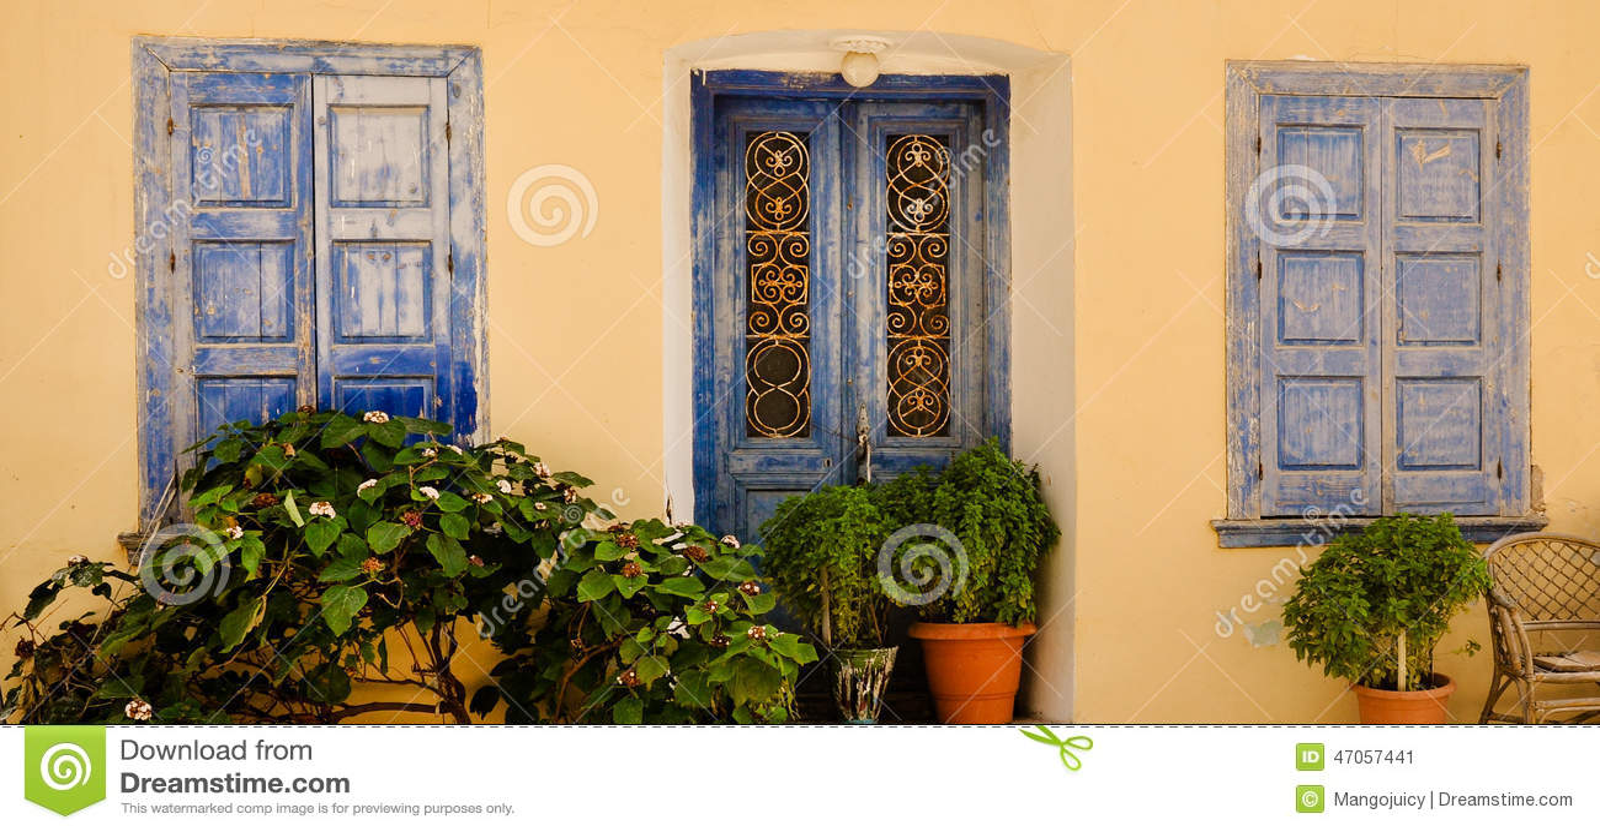 Ornamental blue doors and windows, Samos, Greece